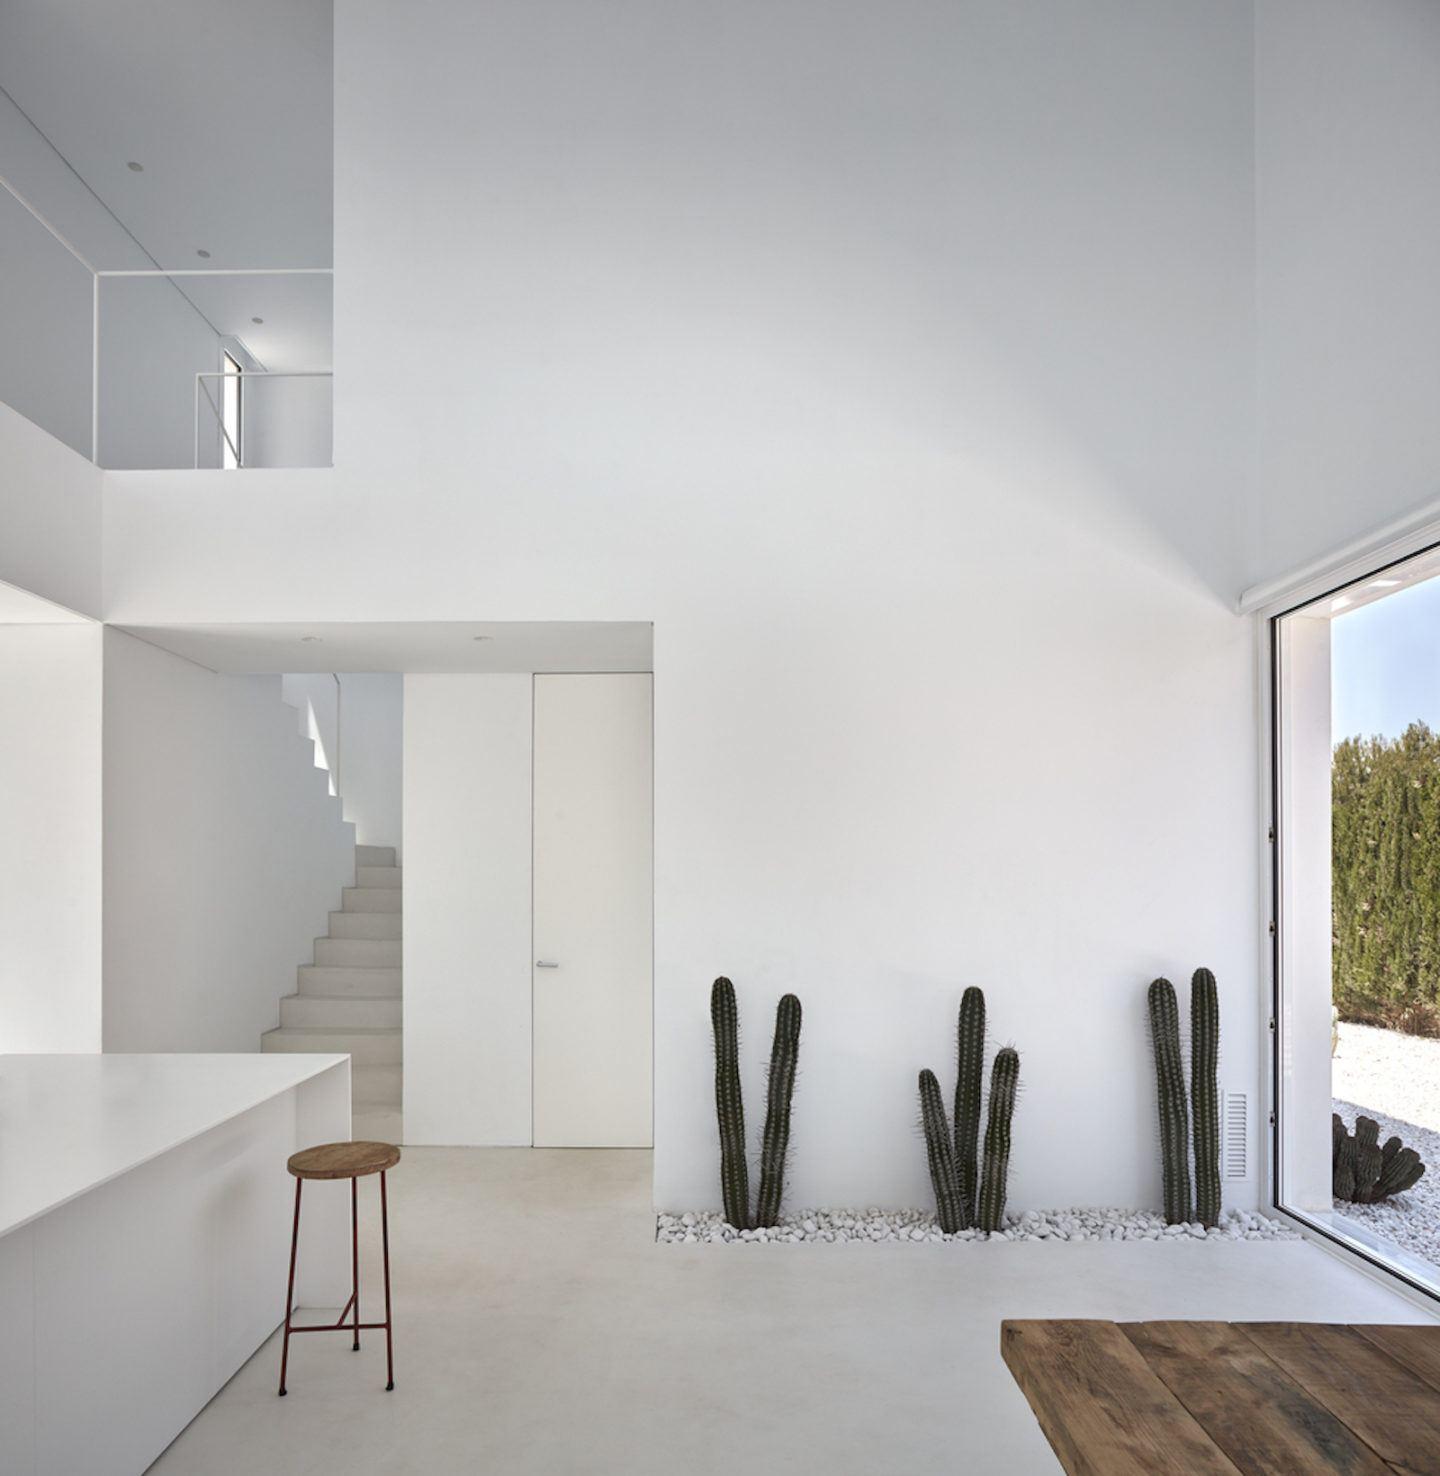 IGNANT-Architecture-Carles-Faus-Arquitectura-Carmen-House-009